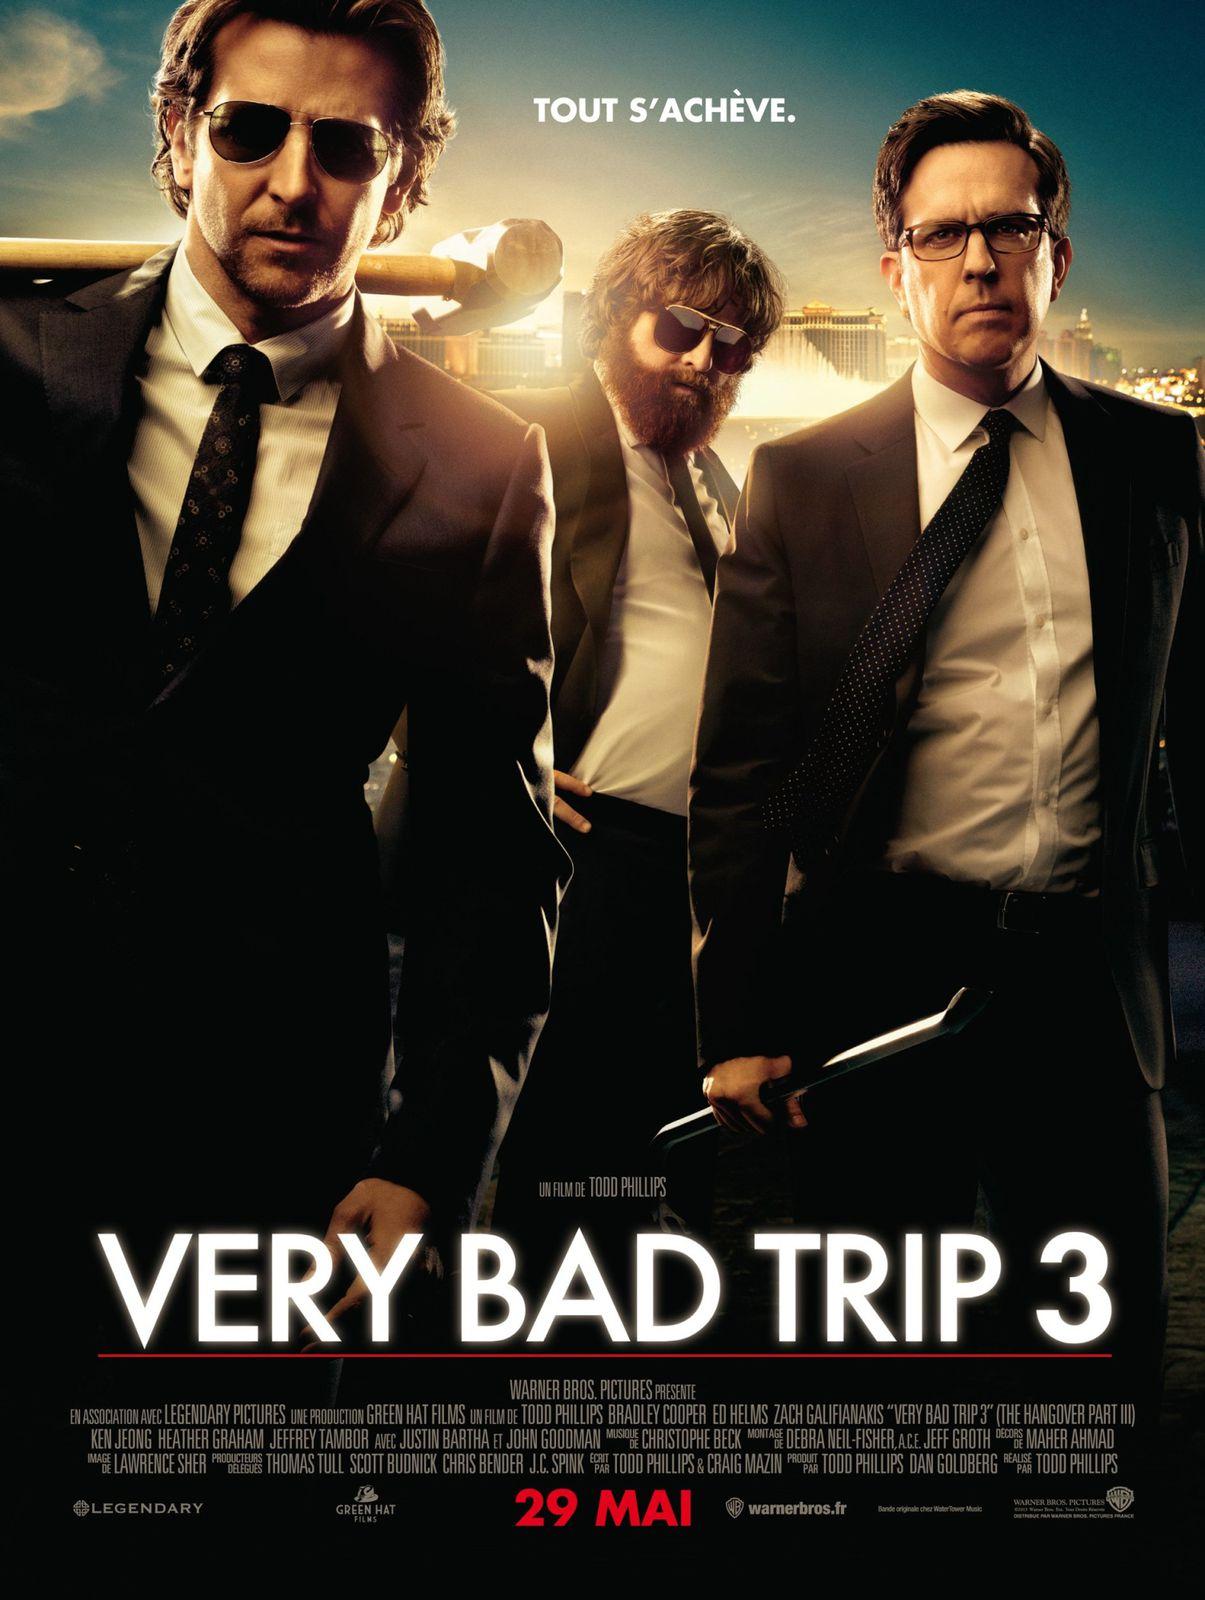 Critique du film Very Bad Trip 3